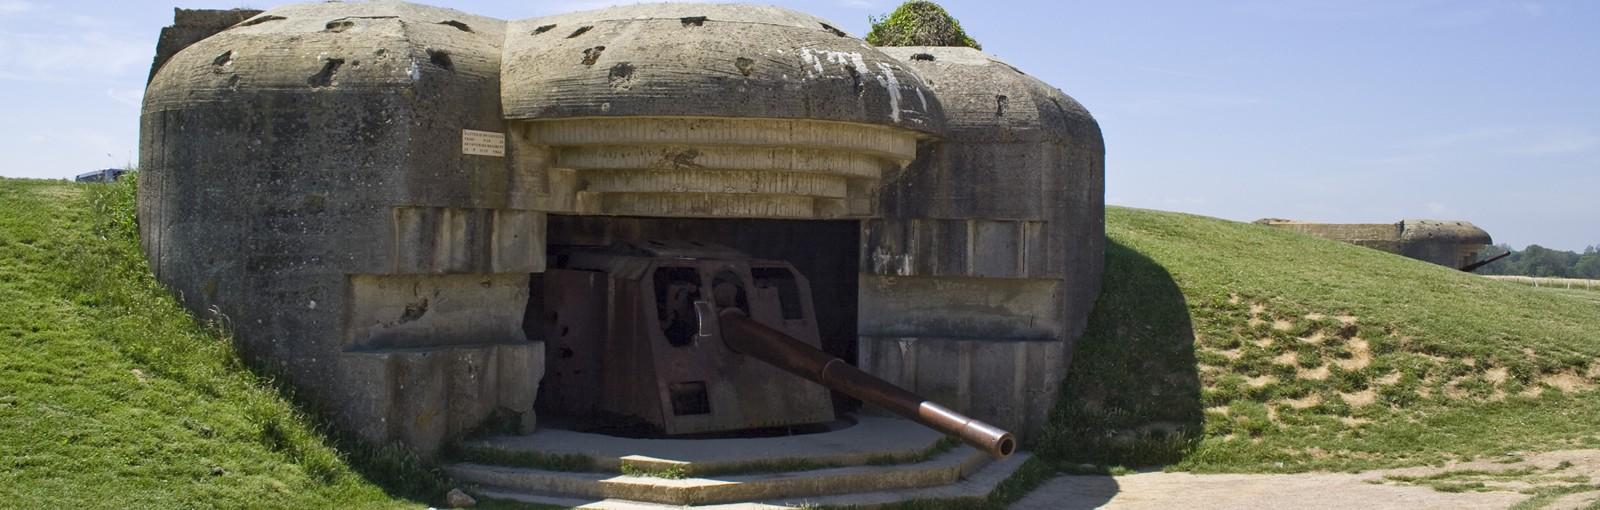 Longues-sur-mer - German battery